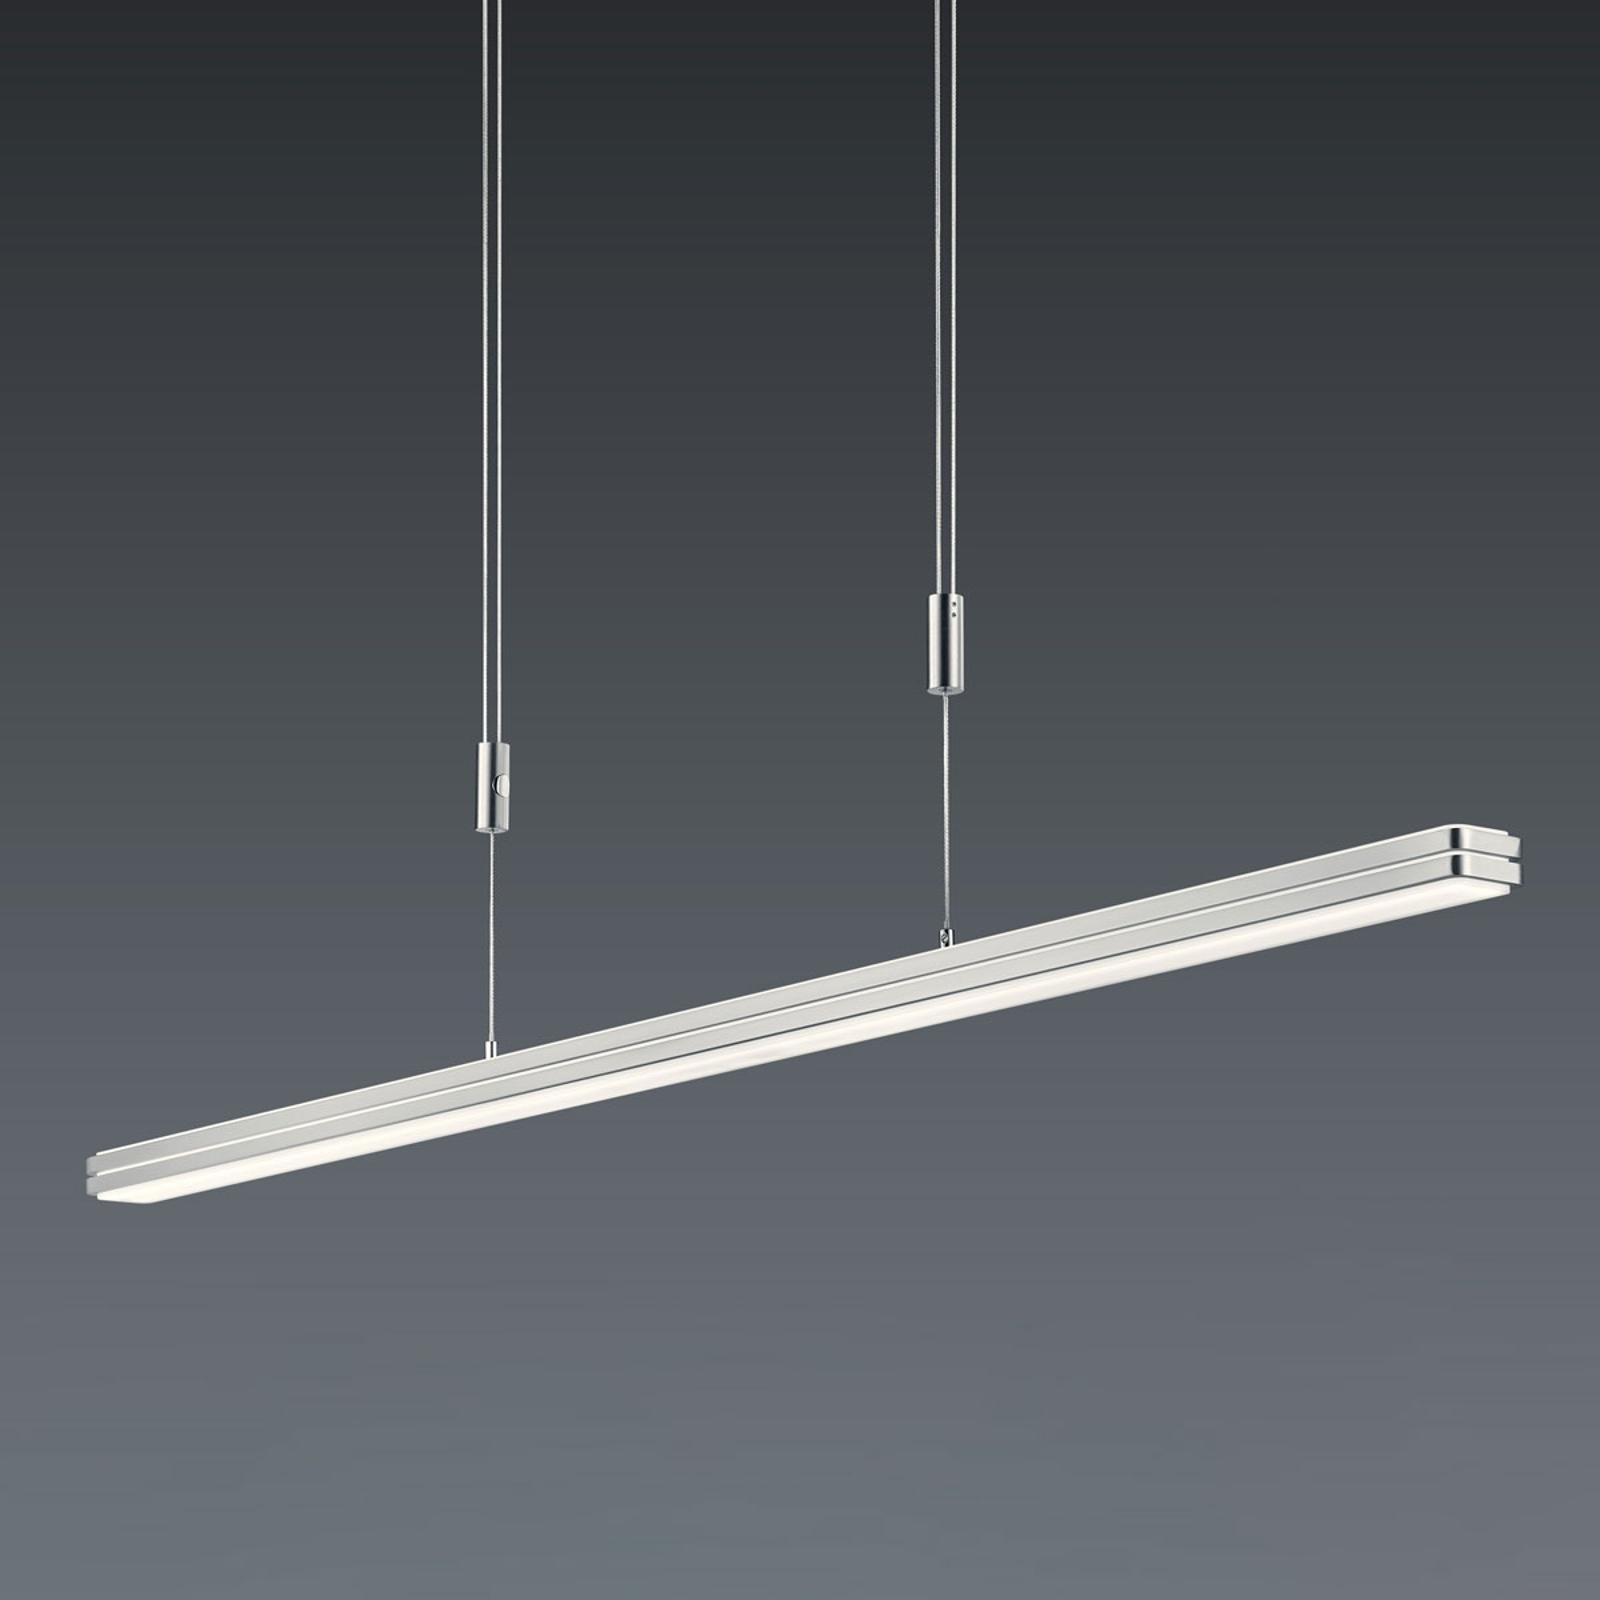 BANKAMP Gem suspension LED, compatible ZigBee